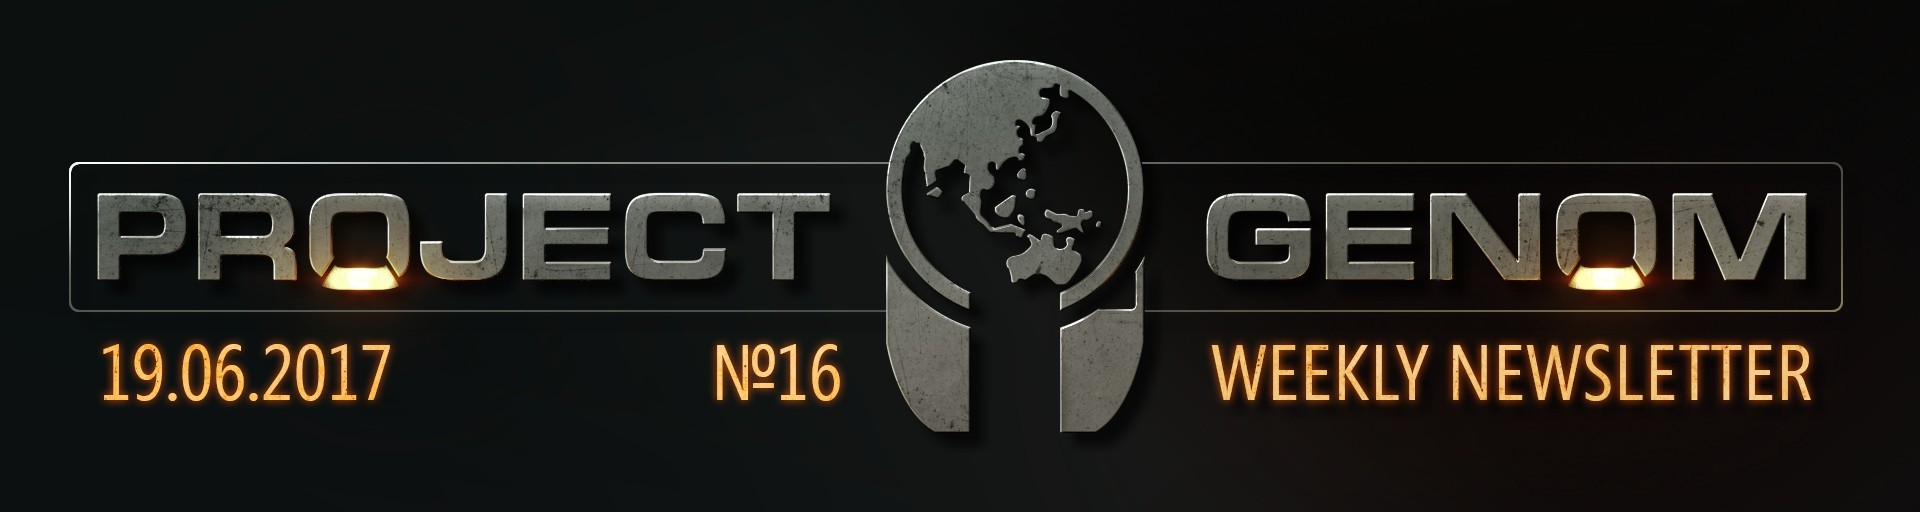 Jun 19, 2017 v2 3 Updates the New Crusade Expansion and